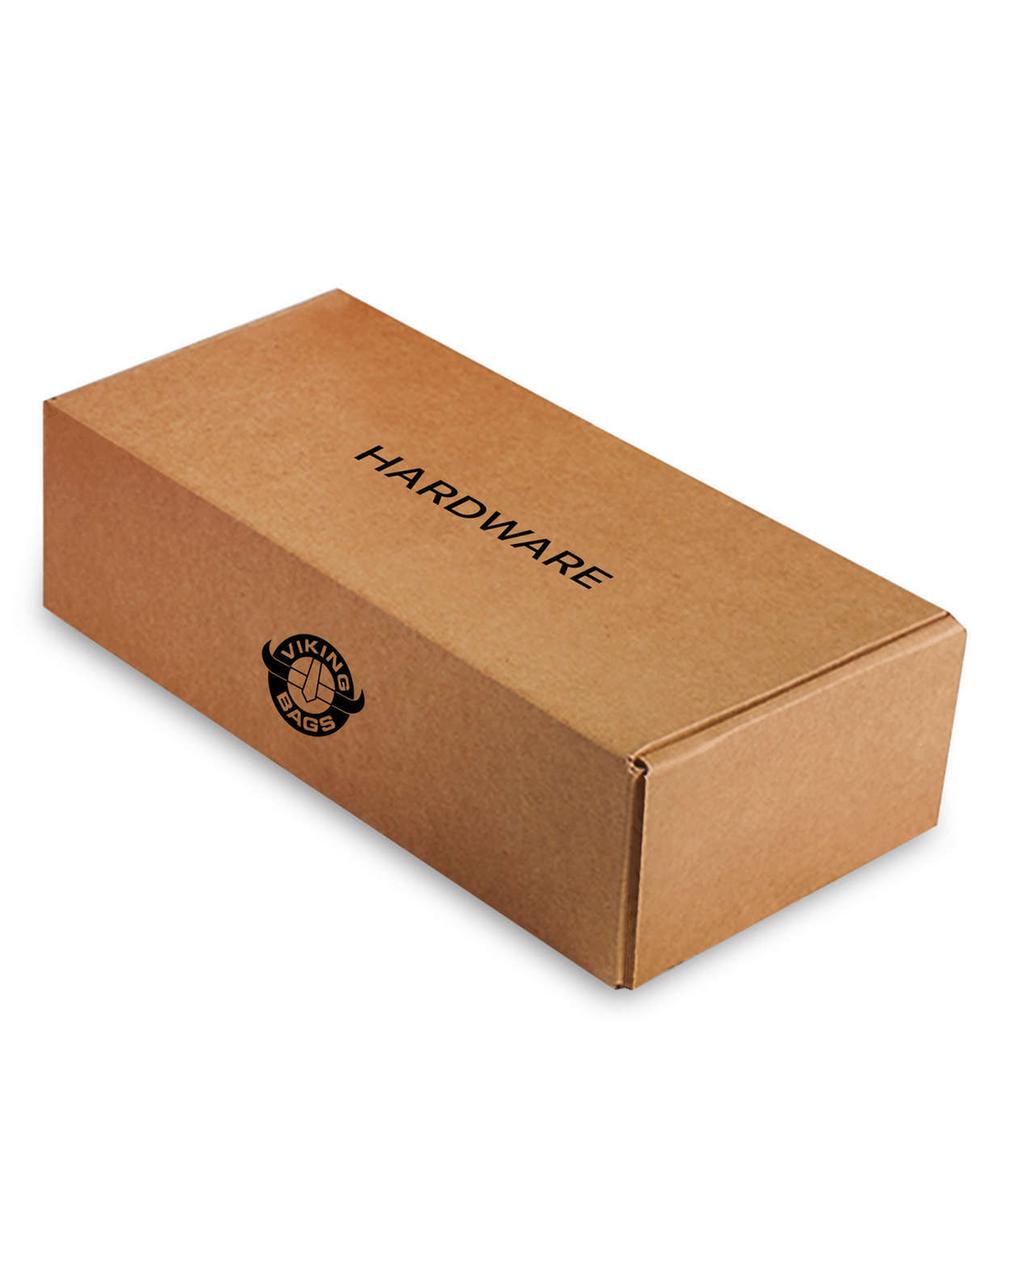 Honda VTX 1800 F Warrior Series Motorcycle Saddlebags Hardware Box